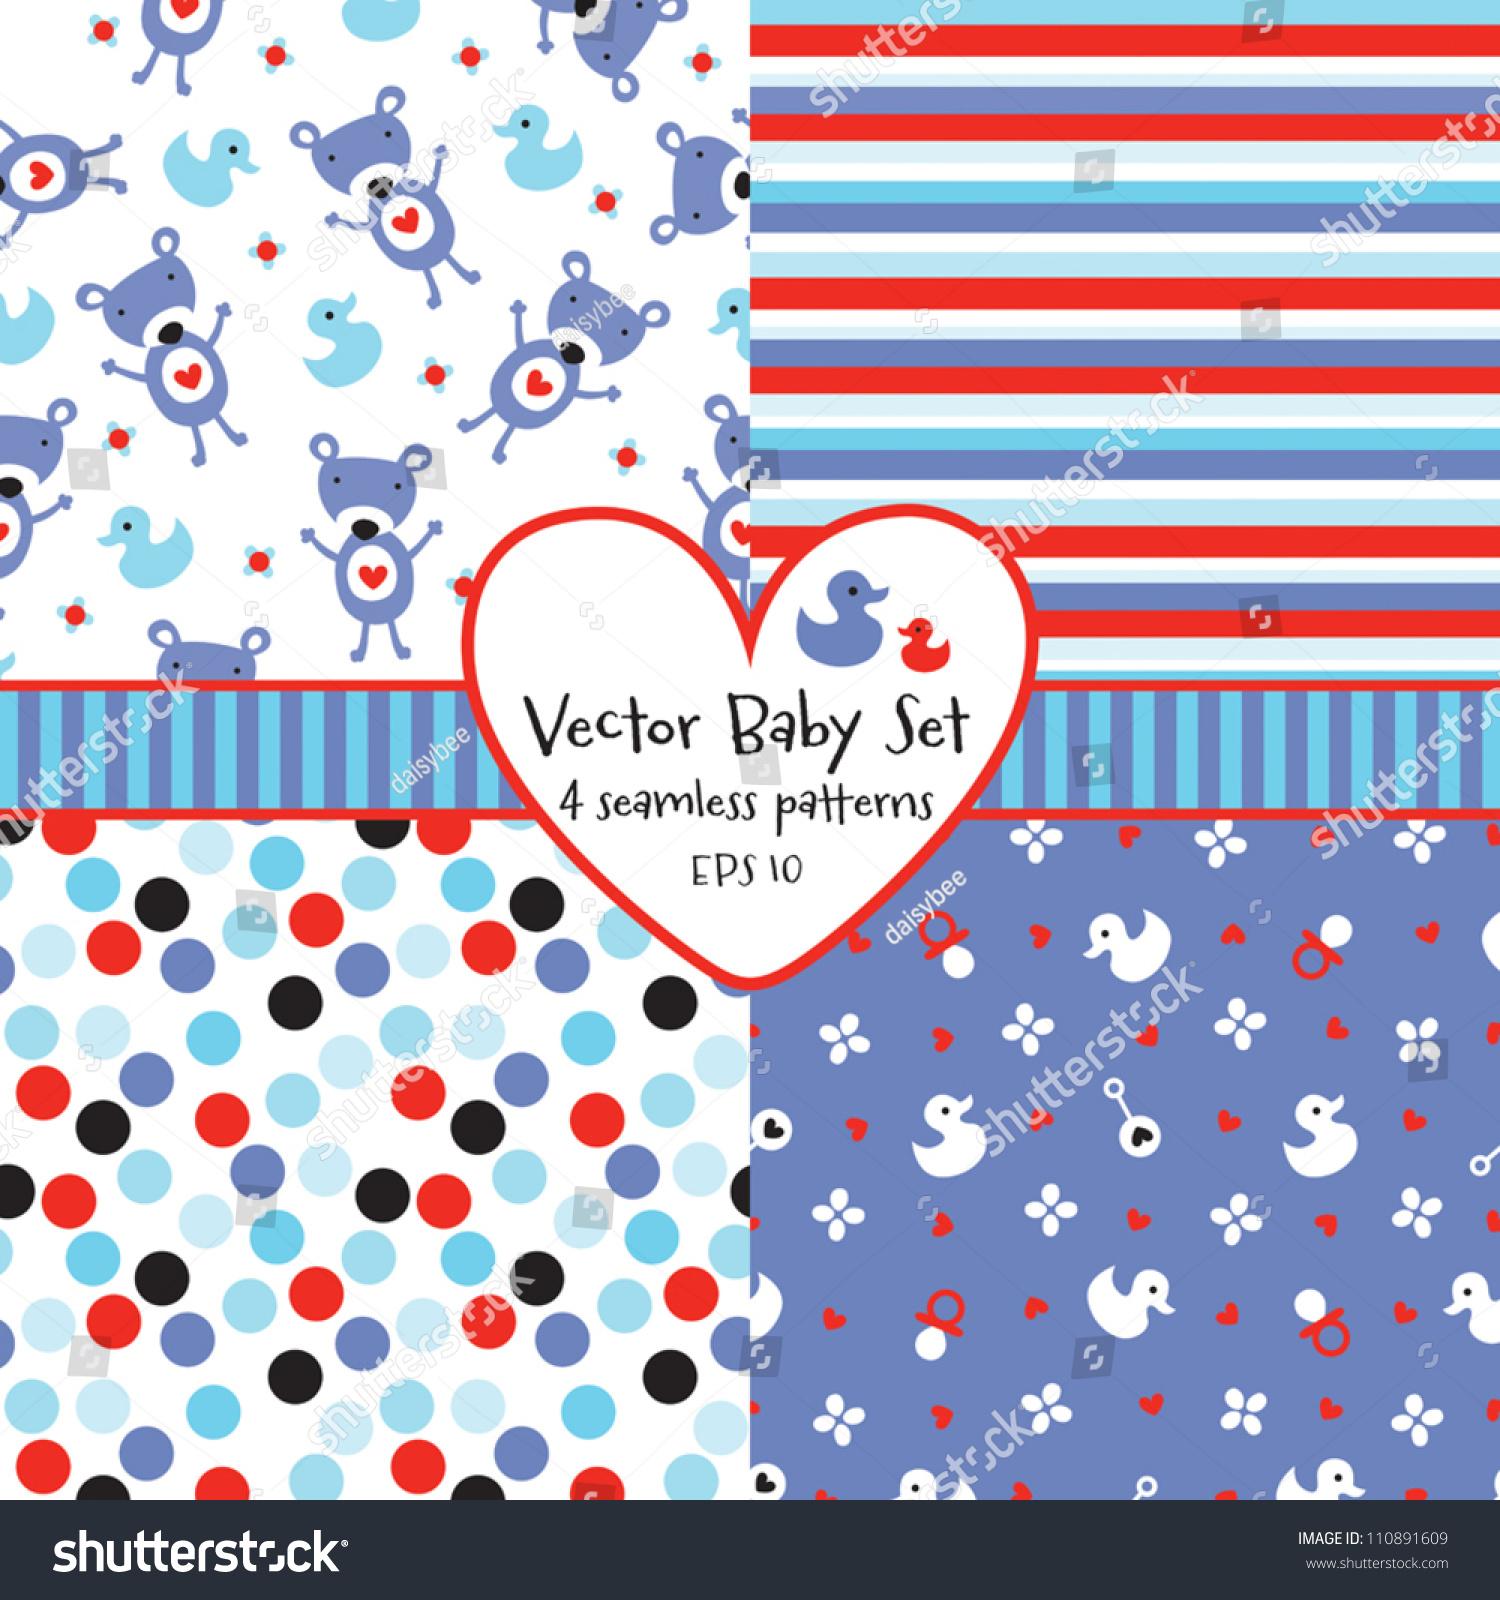 Vector Set 4 Seamless Baby Boy Stock Vector 110891609 Shutterstock